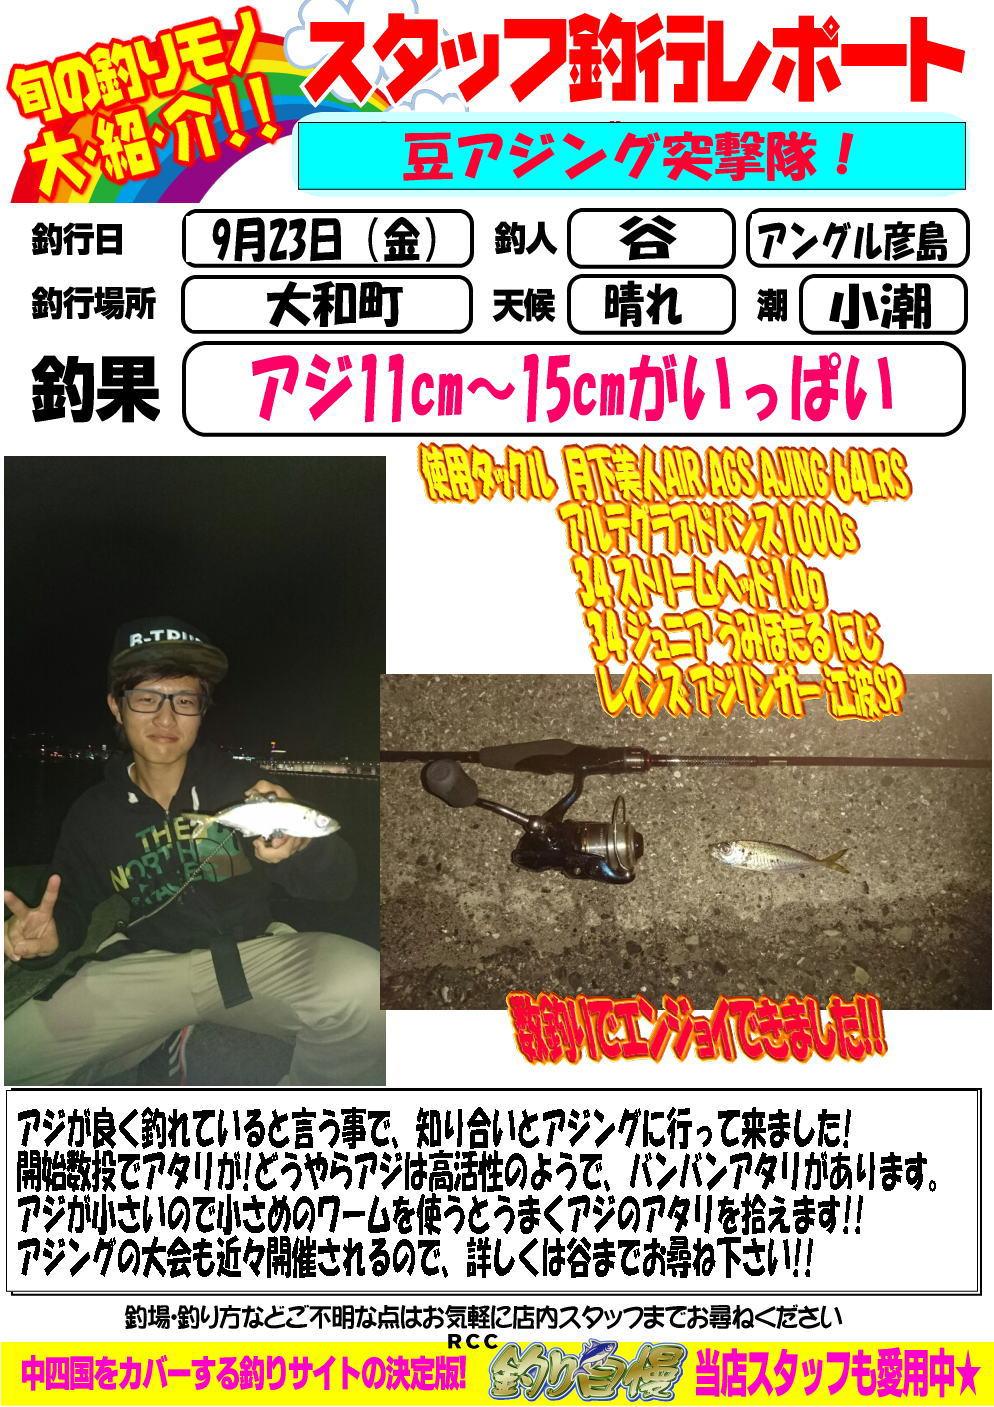 http://www.e-angle.co.jp/shop/blog/blog-20160923-hikoshima-aji.jpg